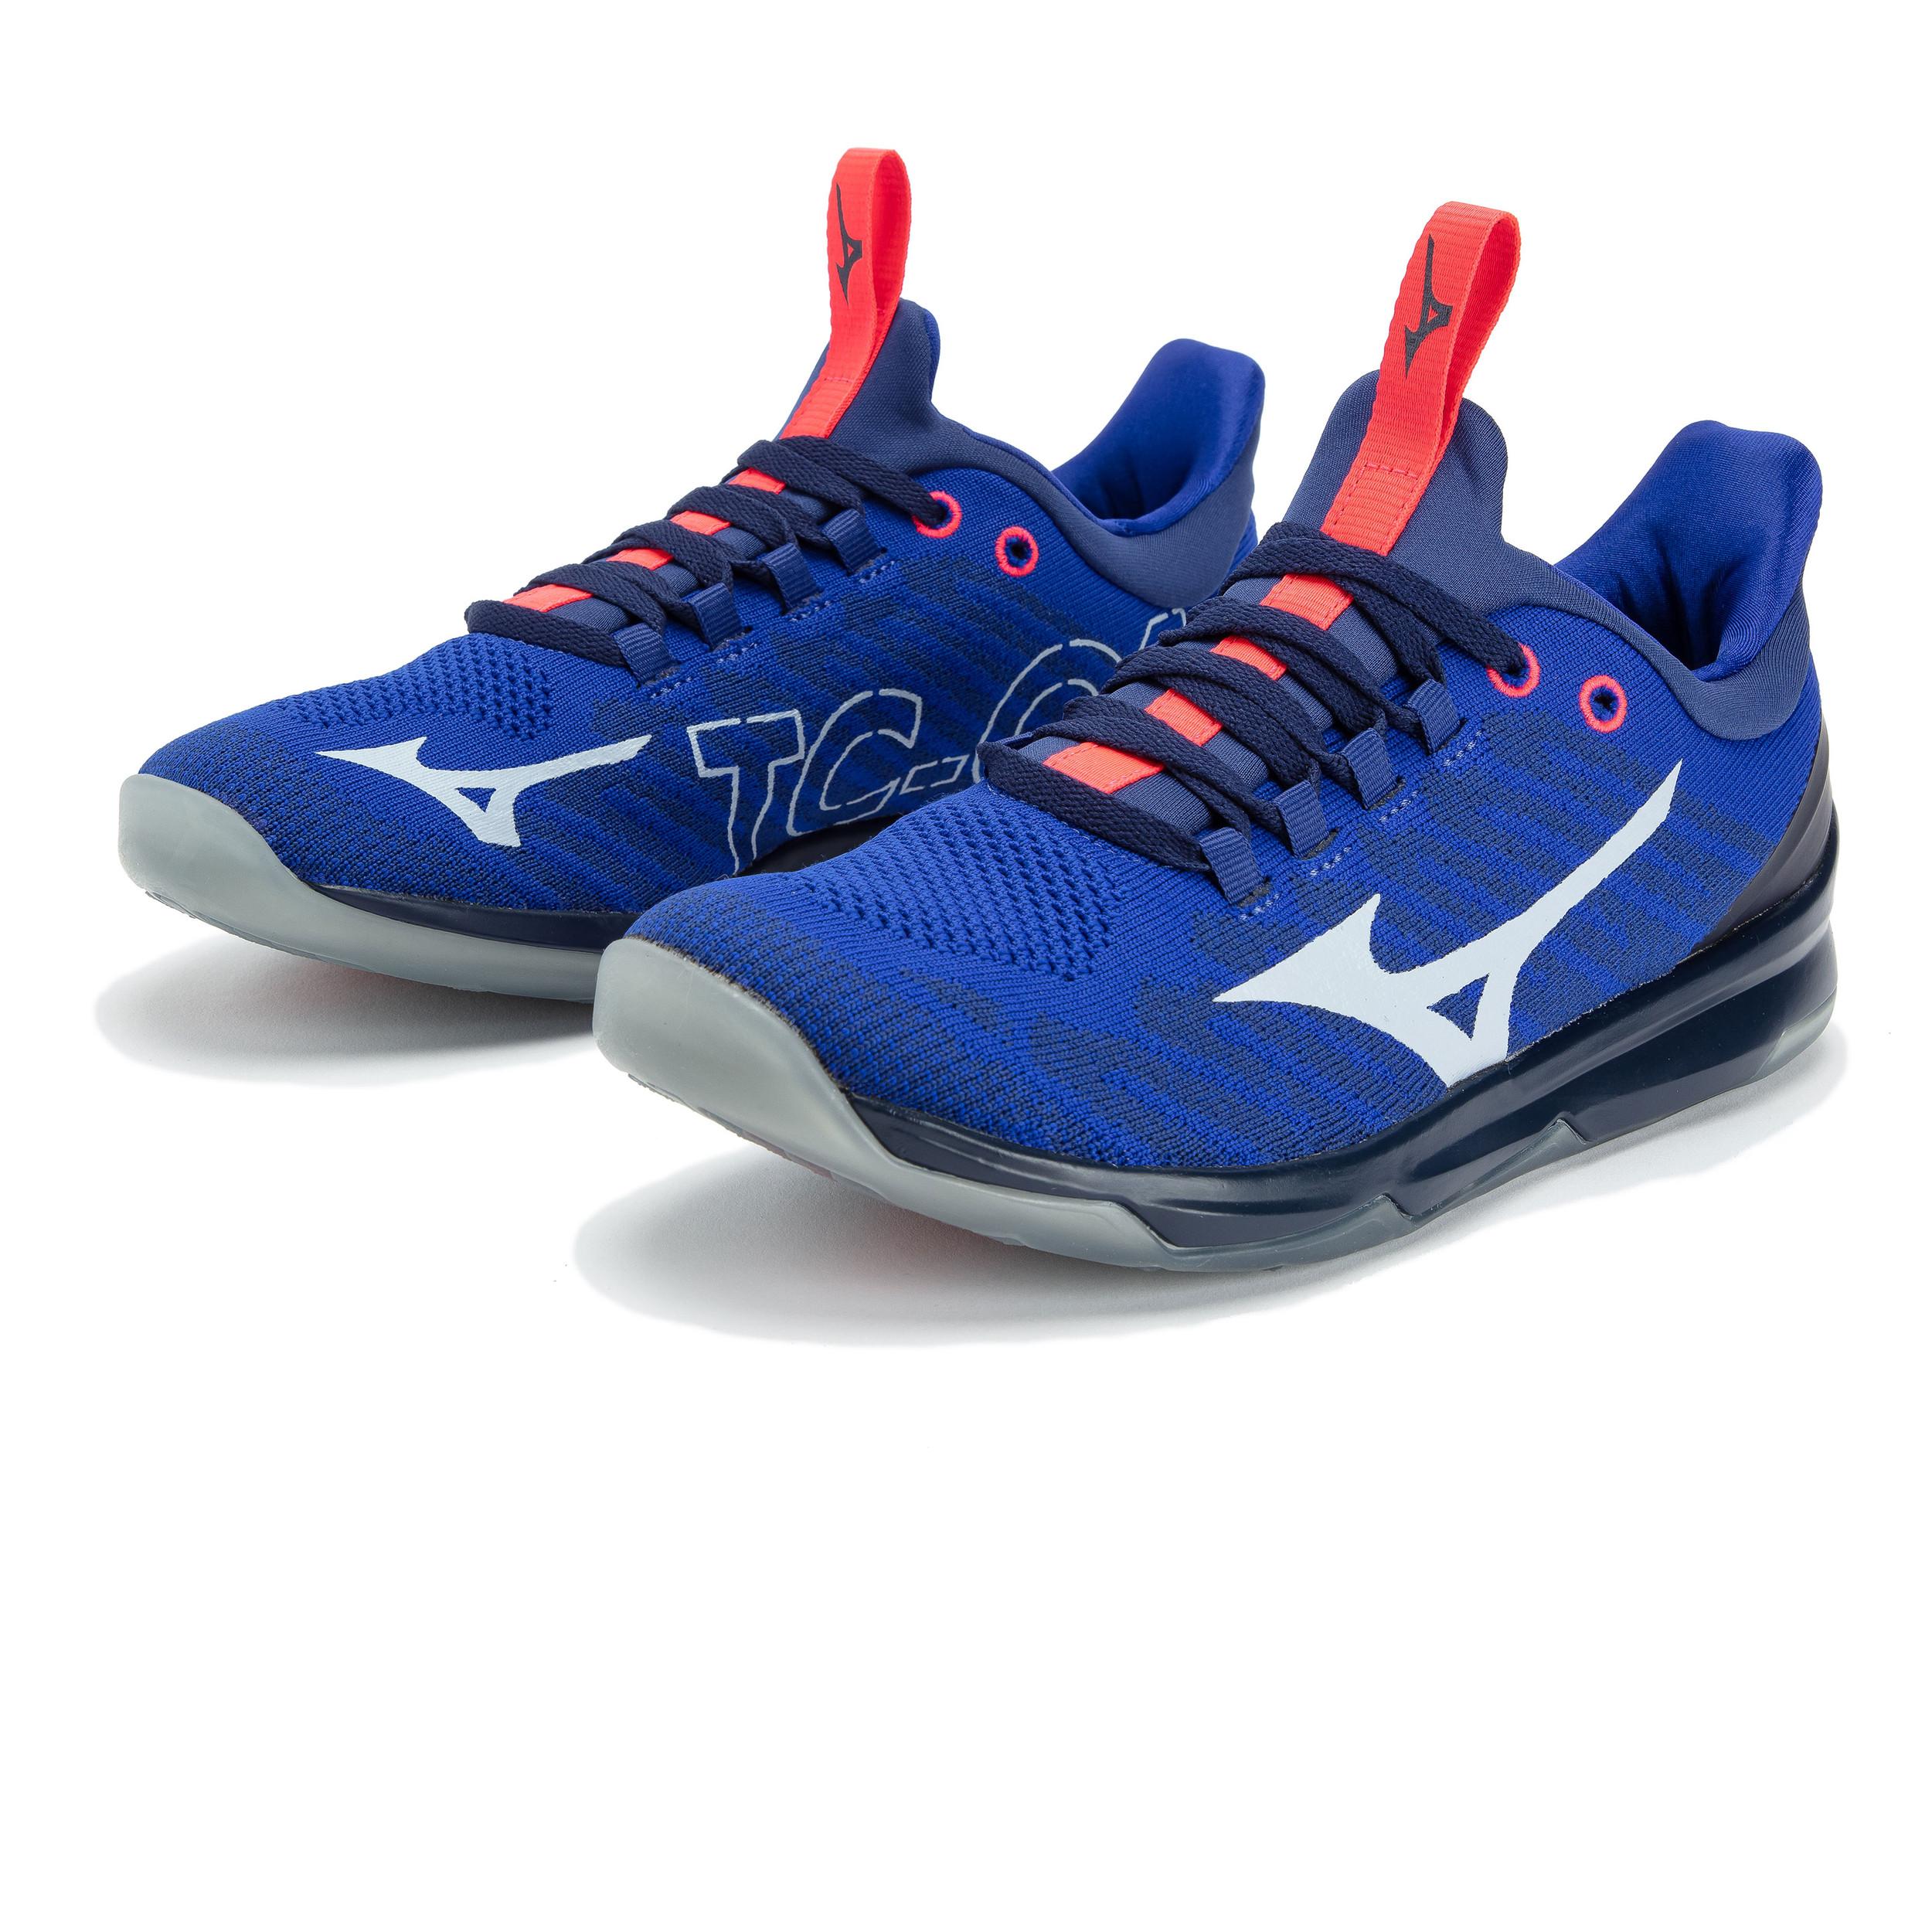 Mizuno TC-01 Training Shoes - AW20